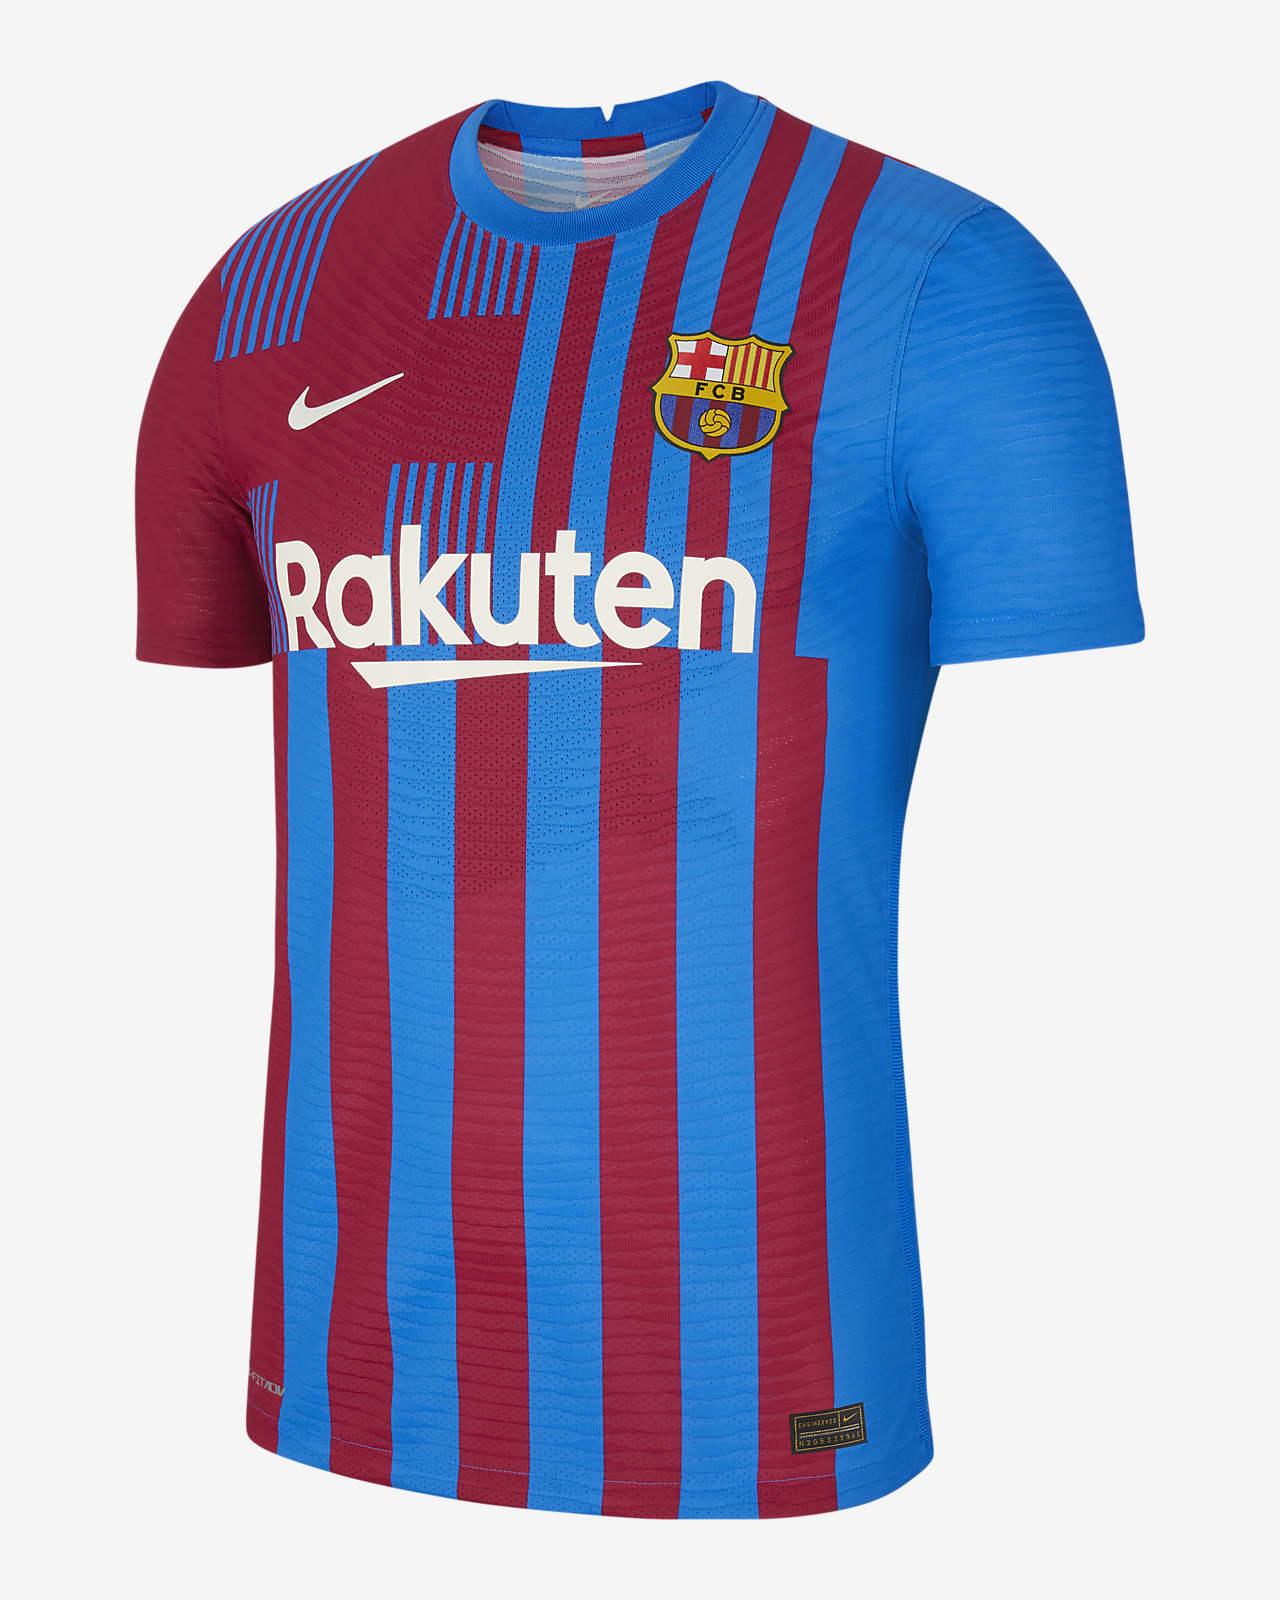 F.C. Barcelona 2021/22 Match Home Men's Nike Dri-FIT ADV Football Shirt